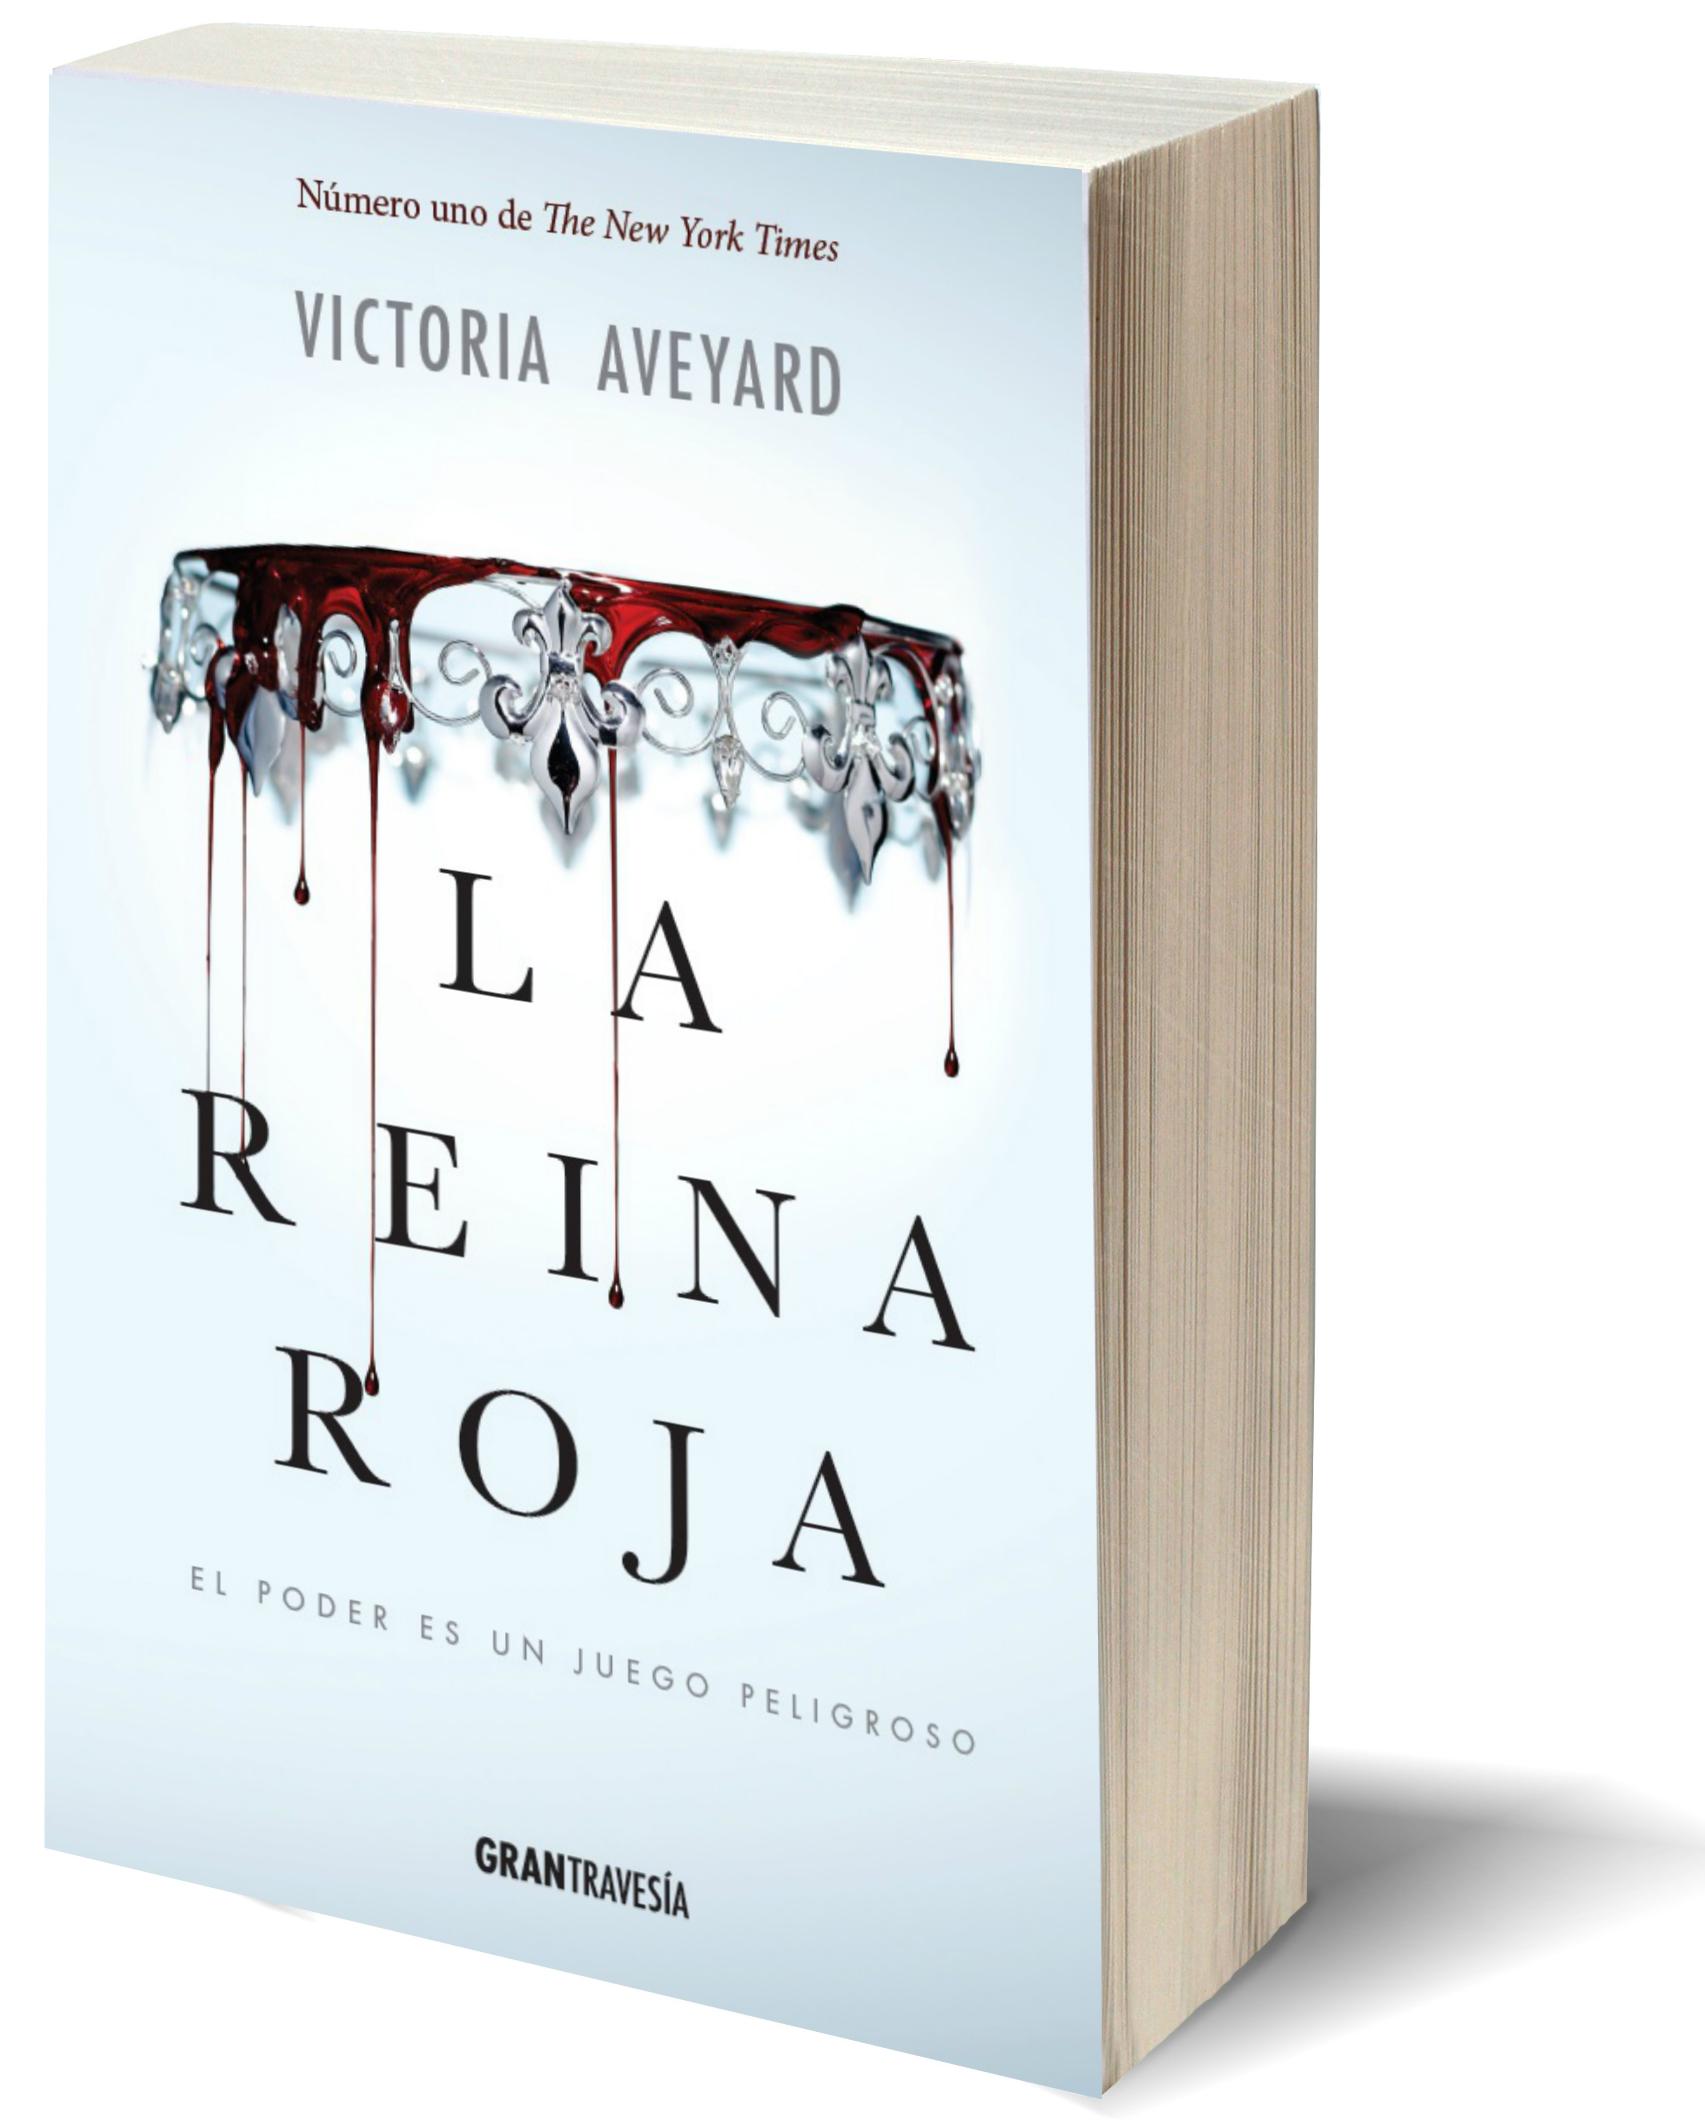 la-reina-roja-victoria aveyard-libros-reseñas-interesantes-opinion-booktag-literatura-blogs-blogger